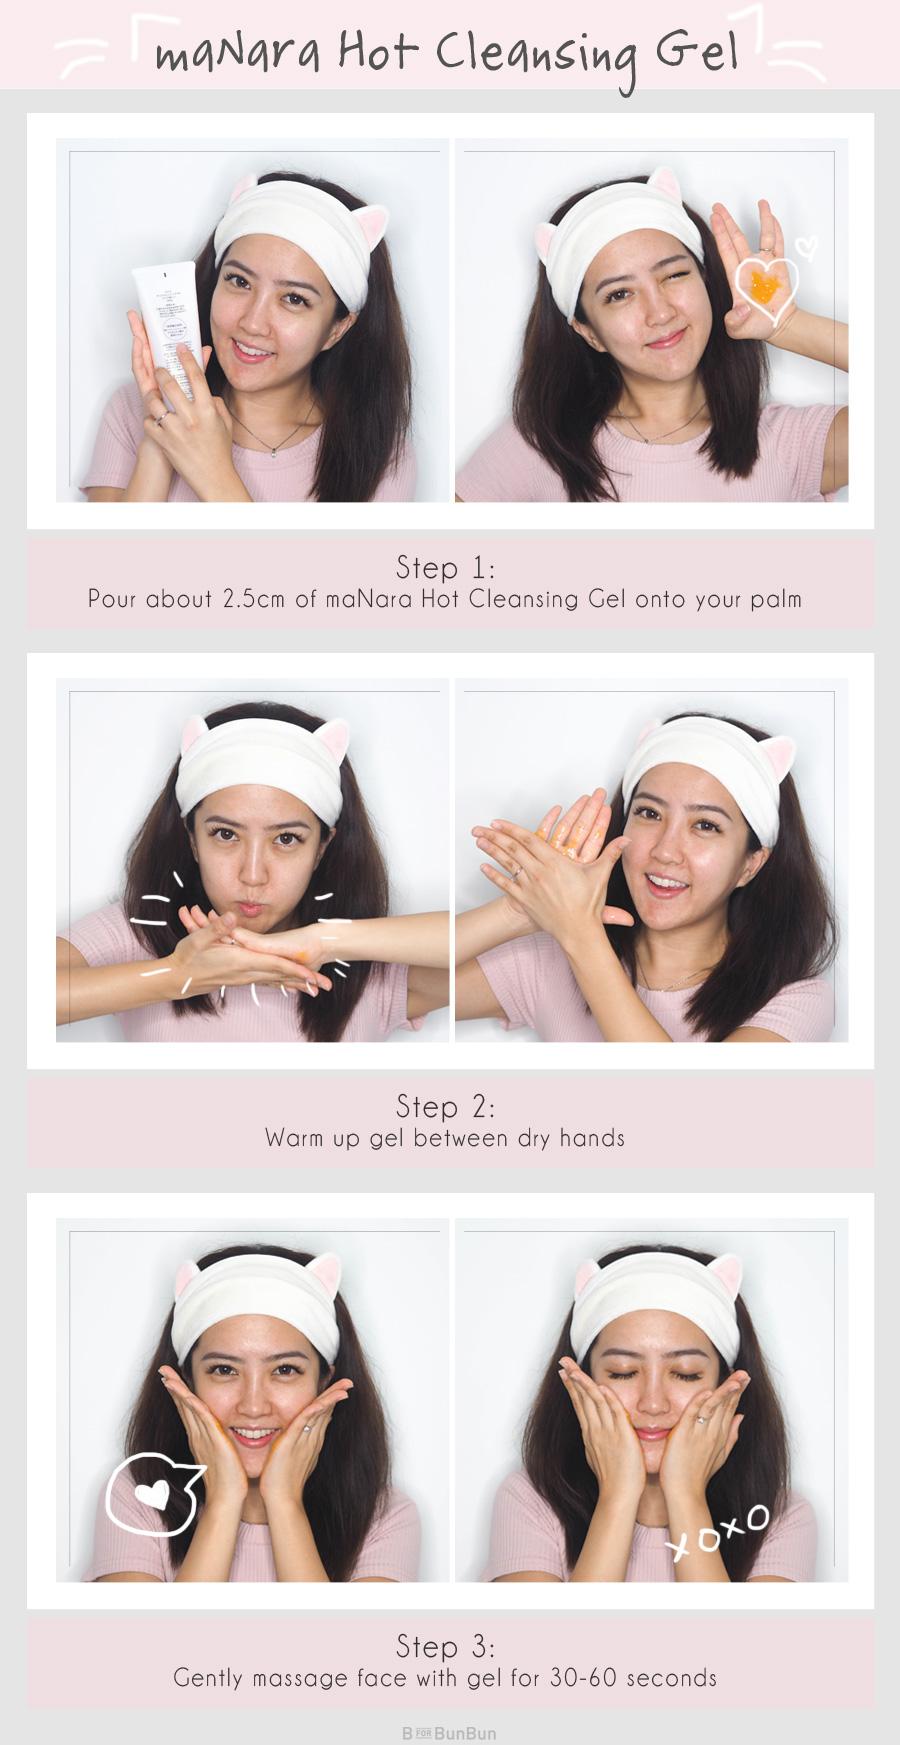 japanese-manara-hot-cleansing-gel-tutorial_1.2